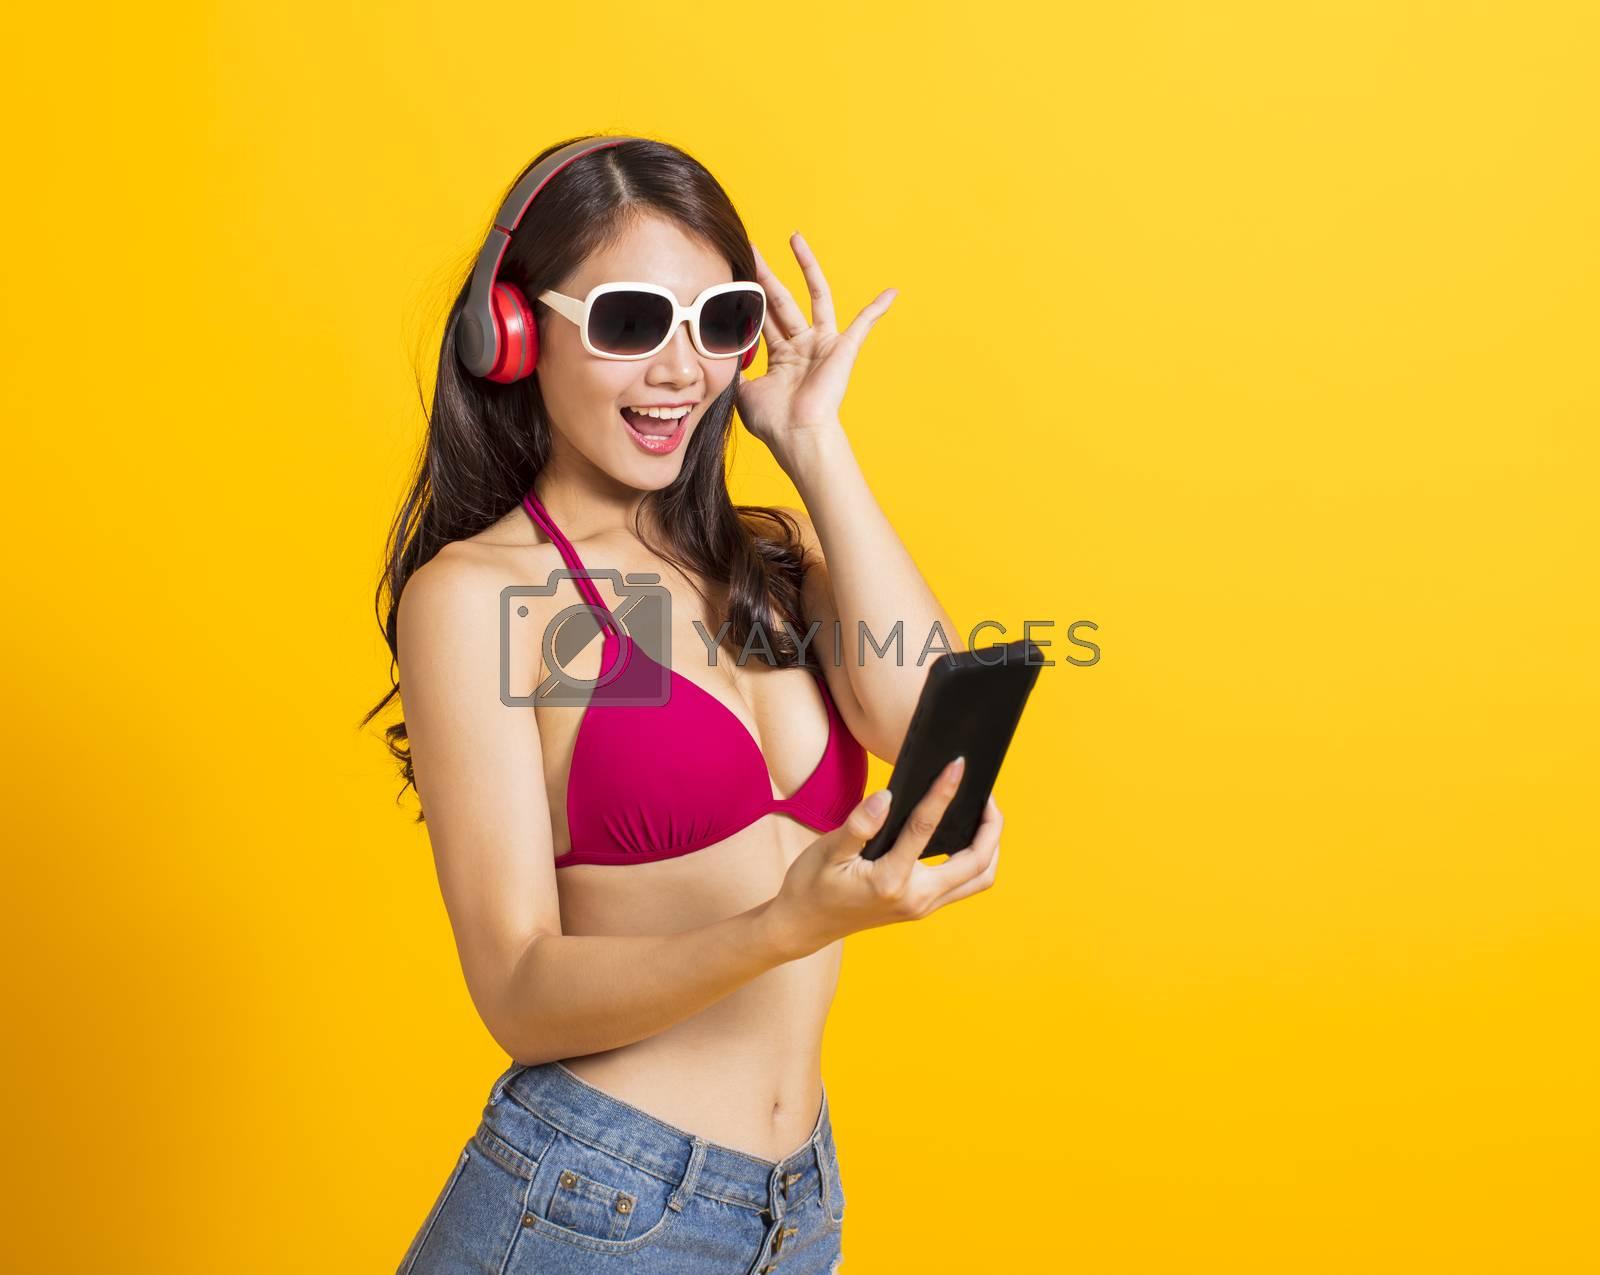 beautiful young woman wearing swimsuit bikini and watching smart phone